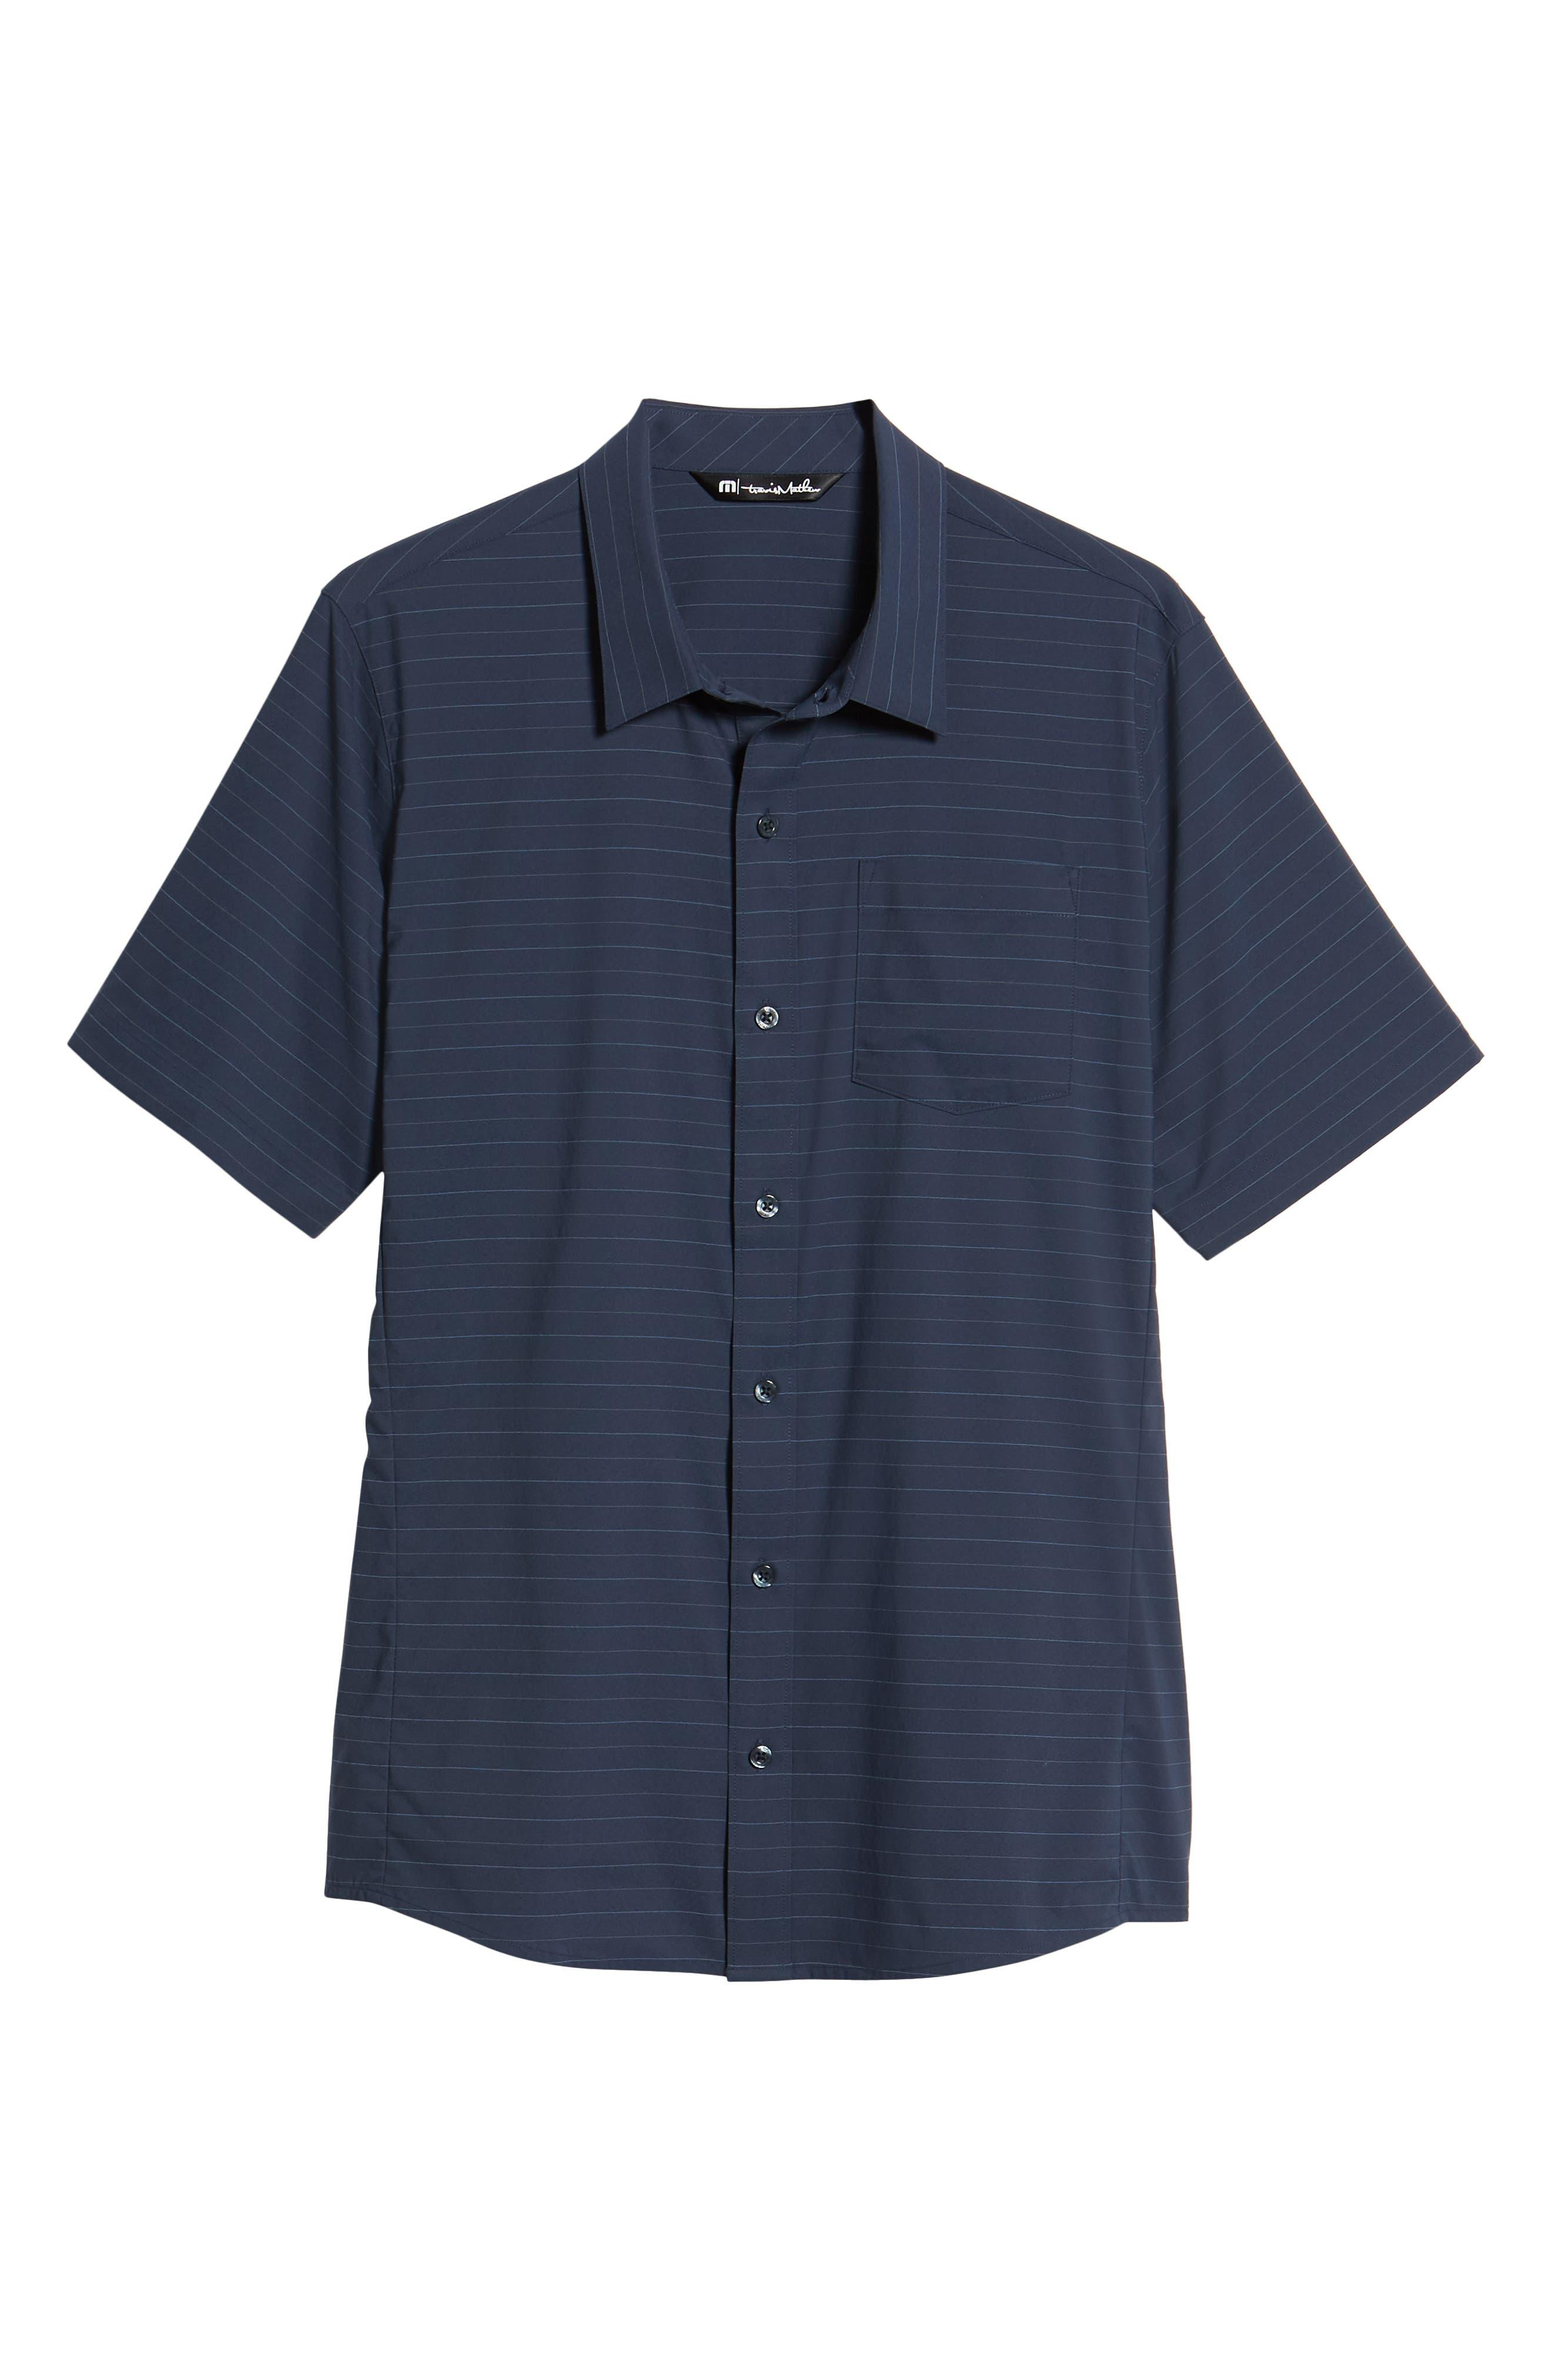 Vagabond Regular Fit Sport Shirt,                             Alternate thumbnail 6, color,                             Heather Blue Nights